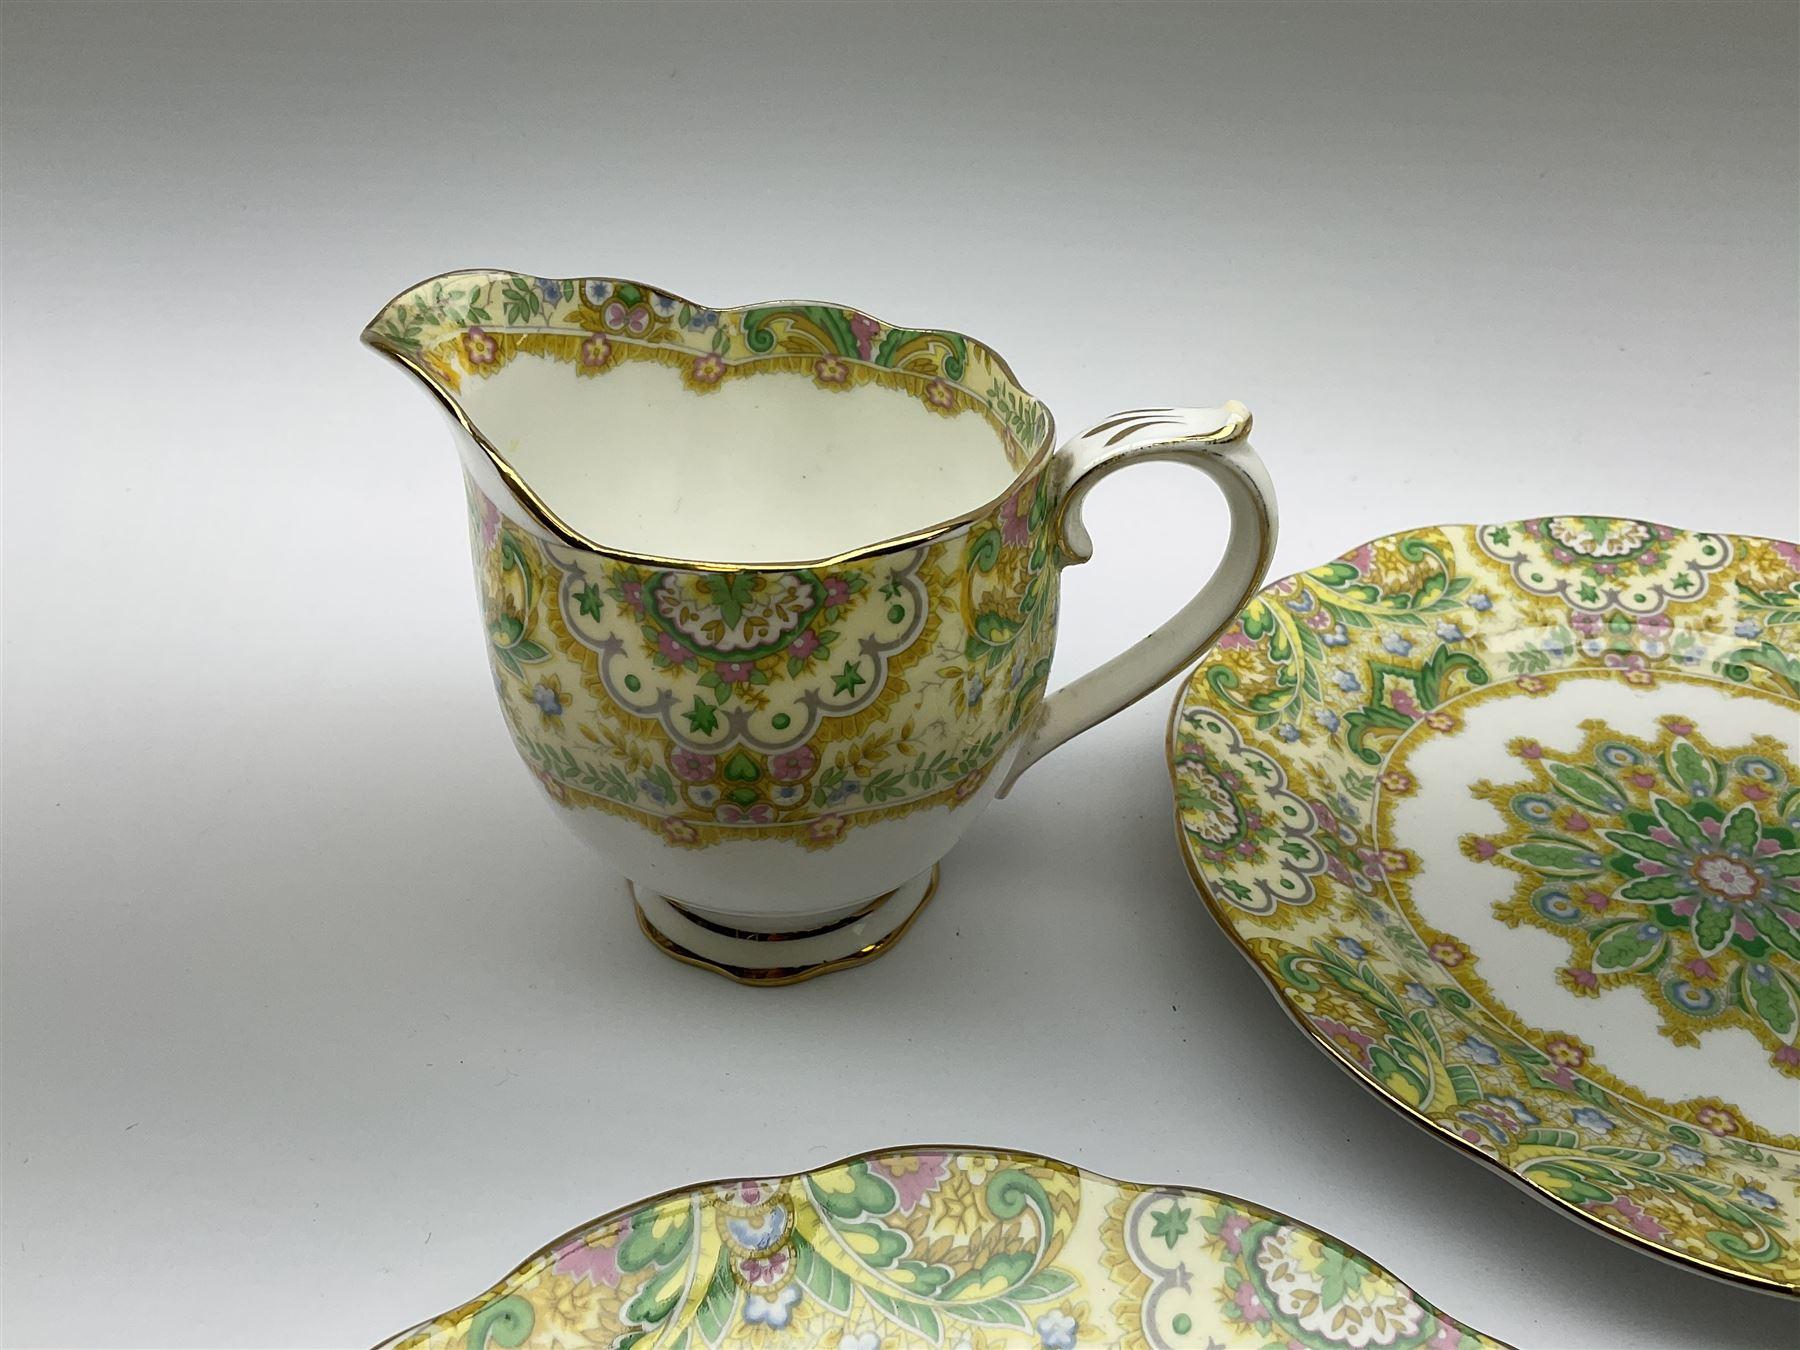 Royal Albert 'Paisley Shawl' pattern part tea set - Image 12 of 12